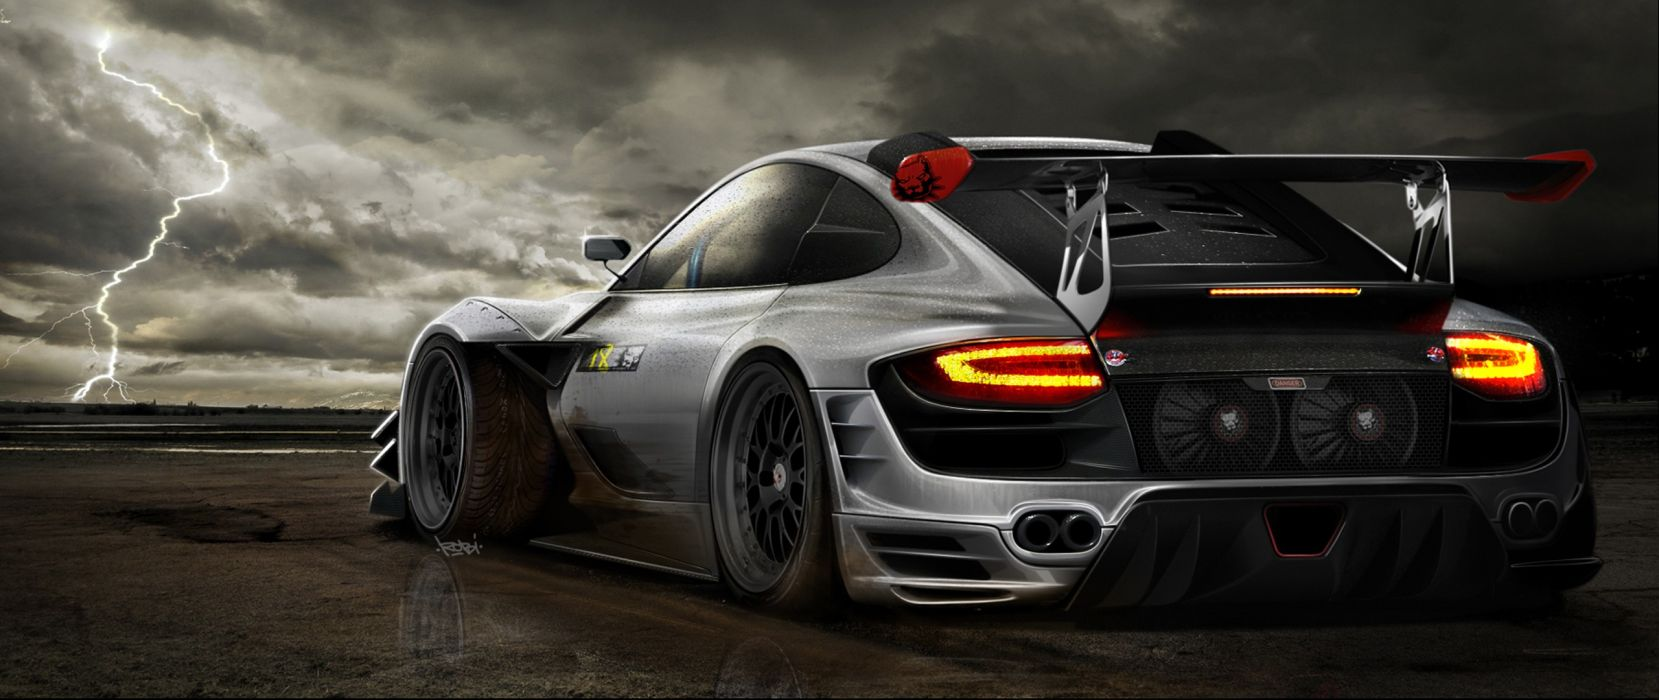 cars wallpaper 2560x1080 219973